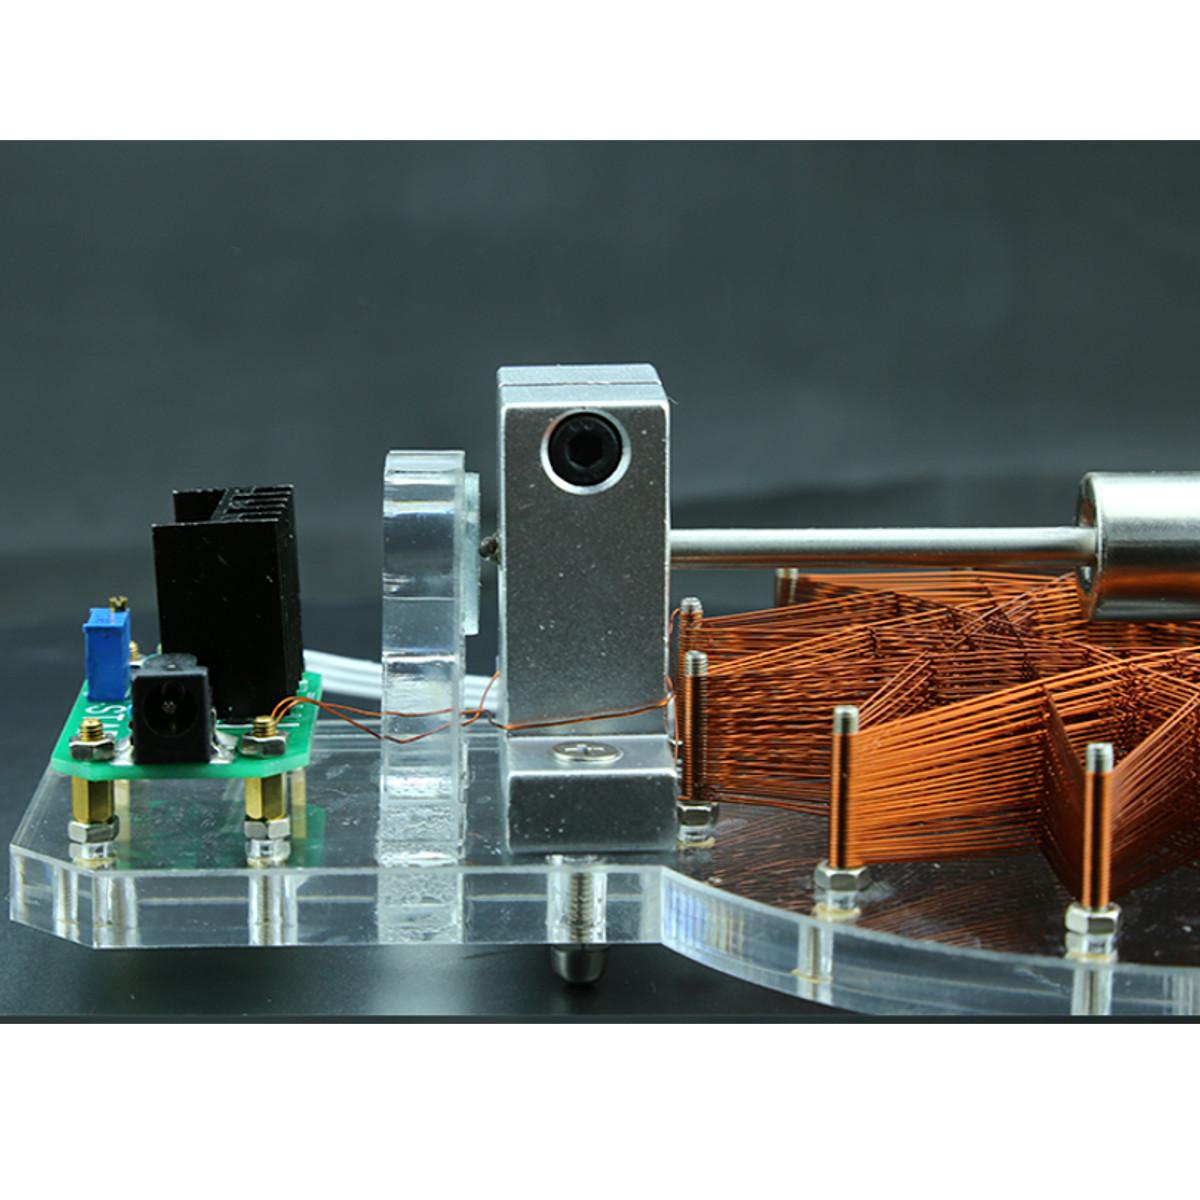 General Science And Electronics Magnetic Levitation 4hvorg